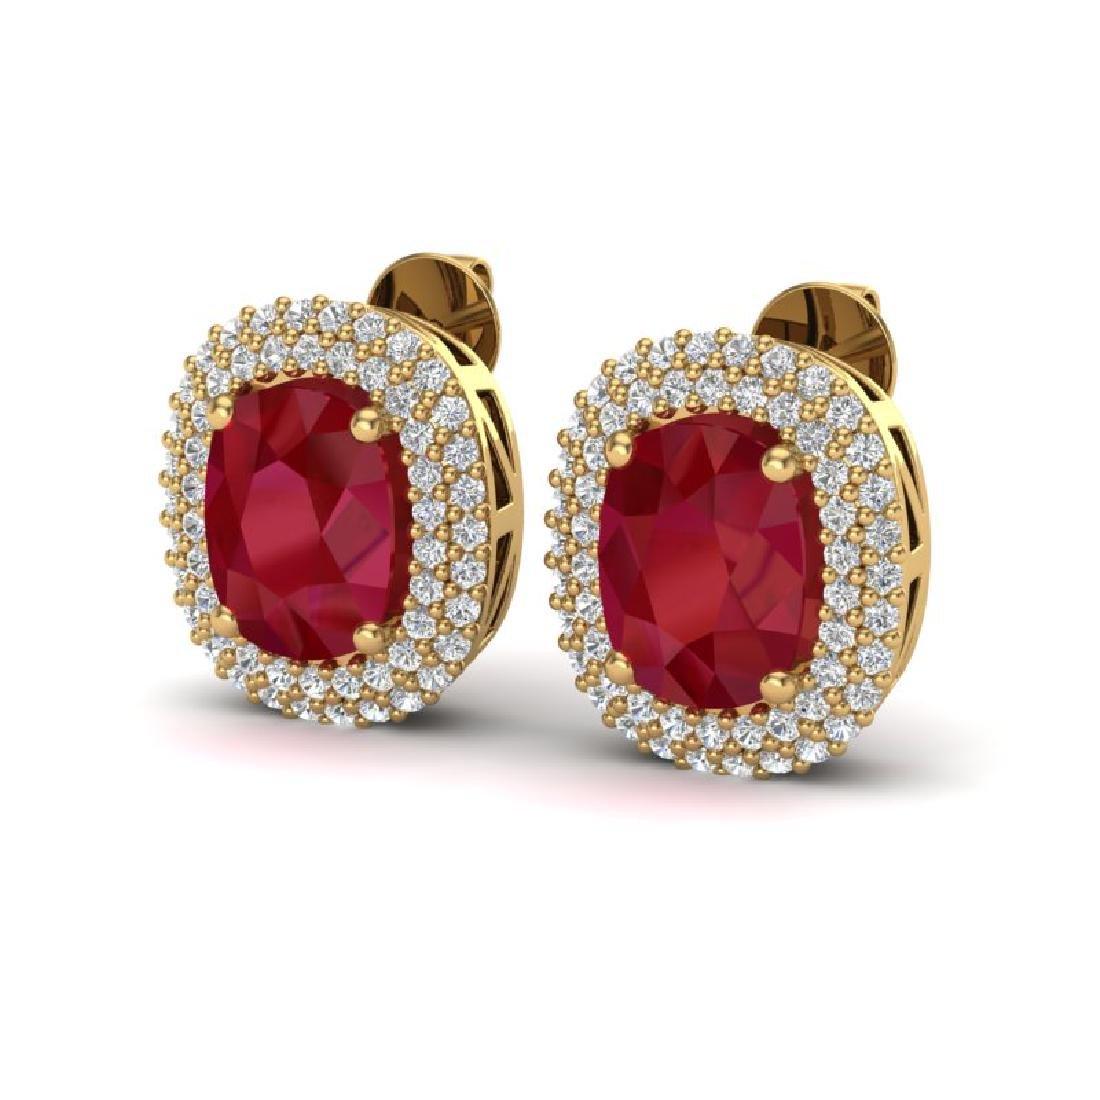 6.30 CTW Ruby & Micro Pave VS/SI Diamond Halo Earrings